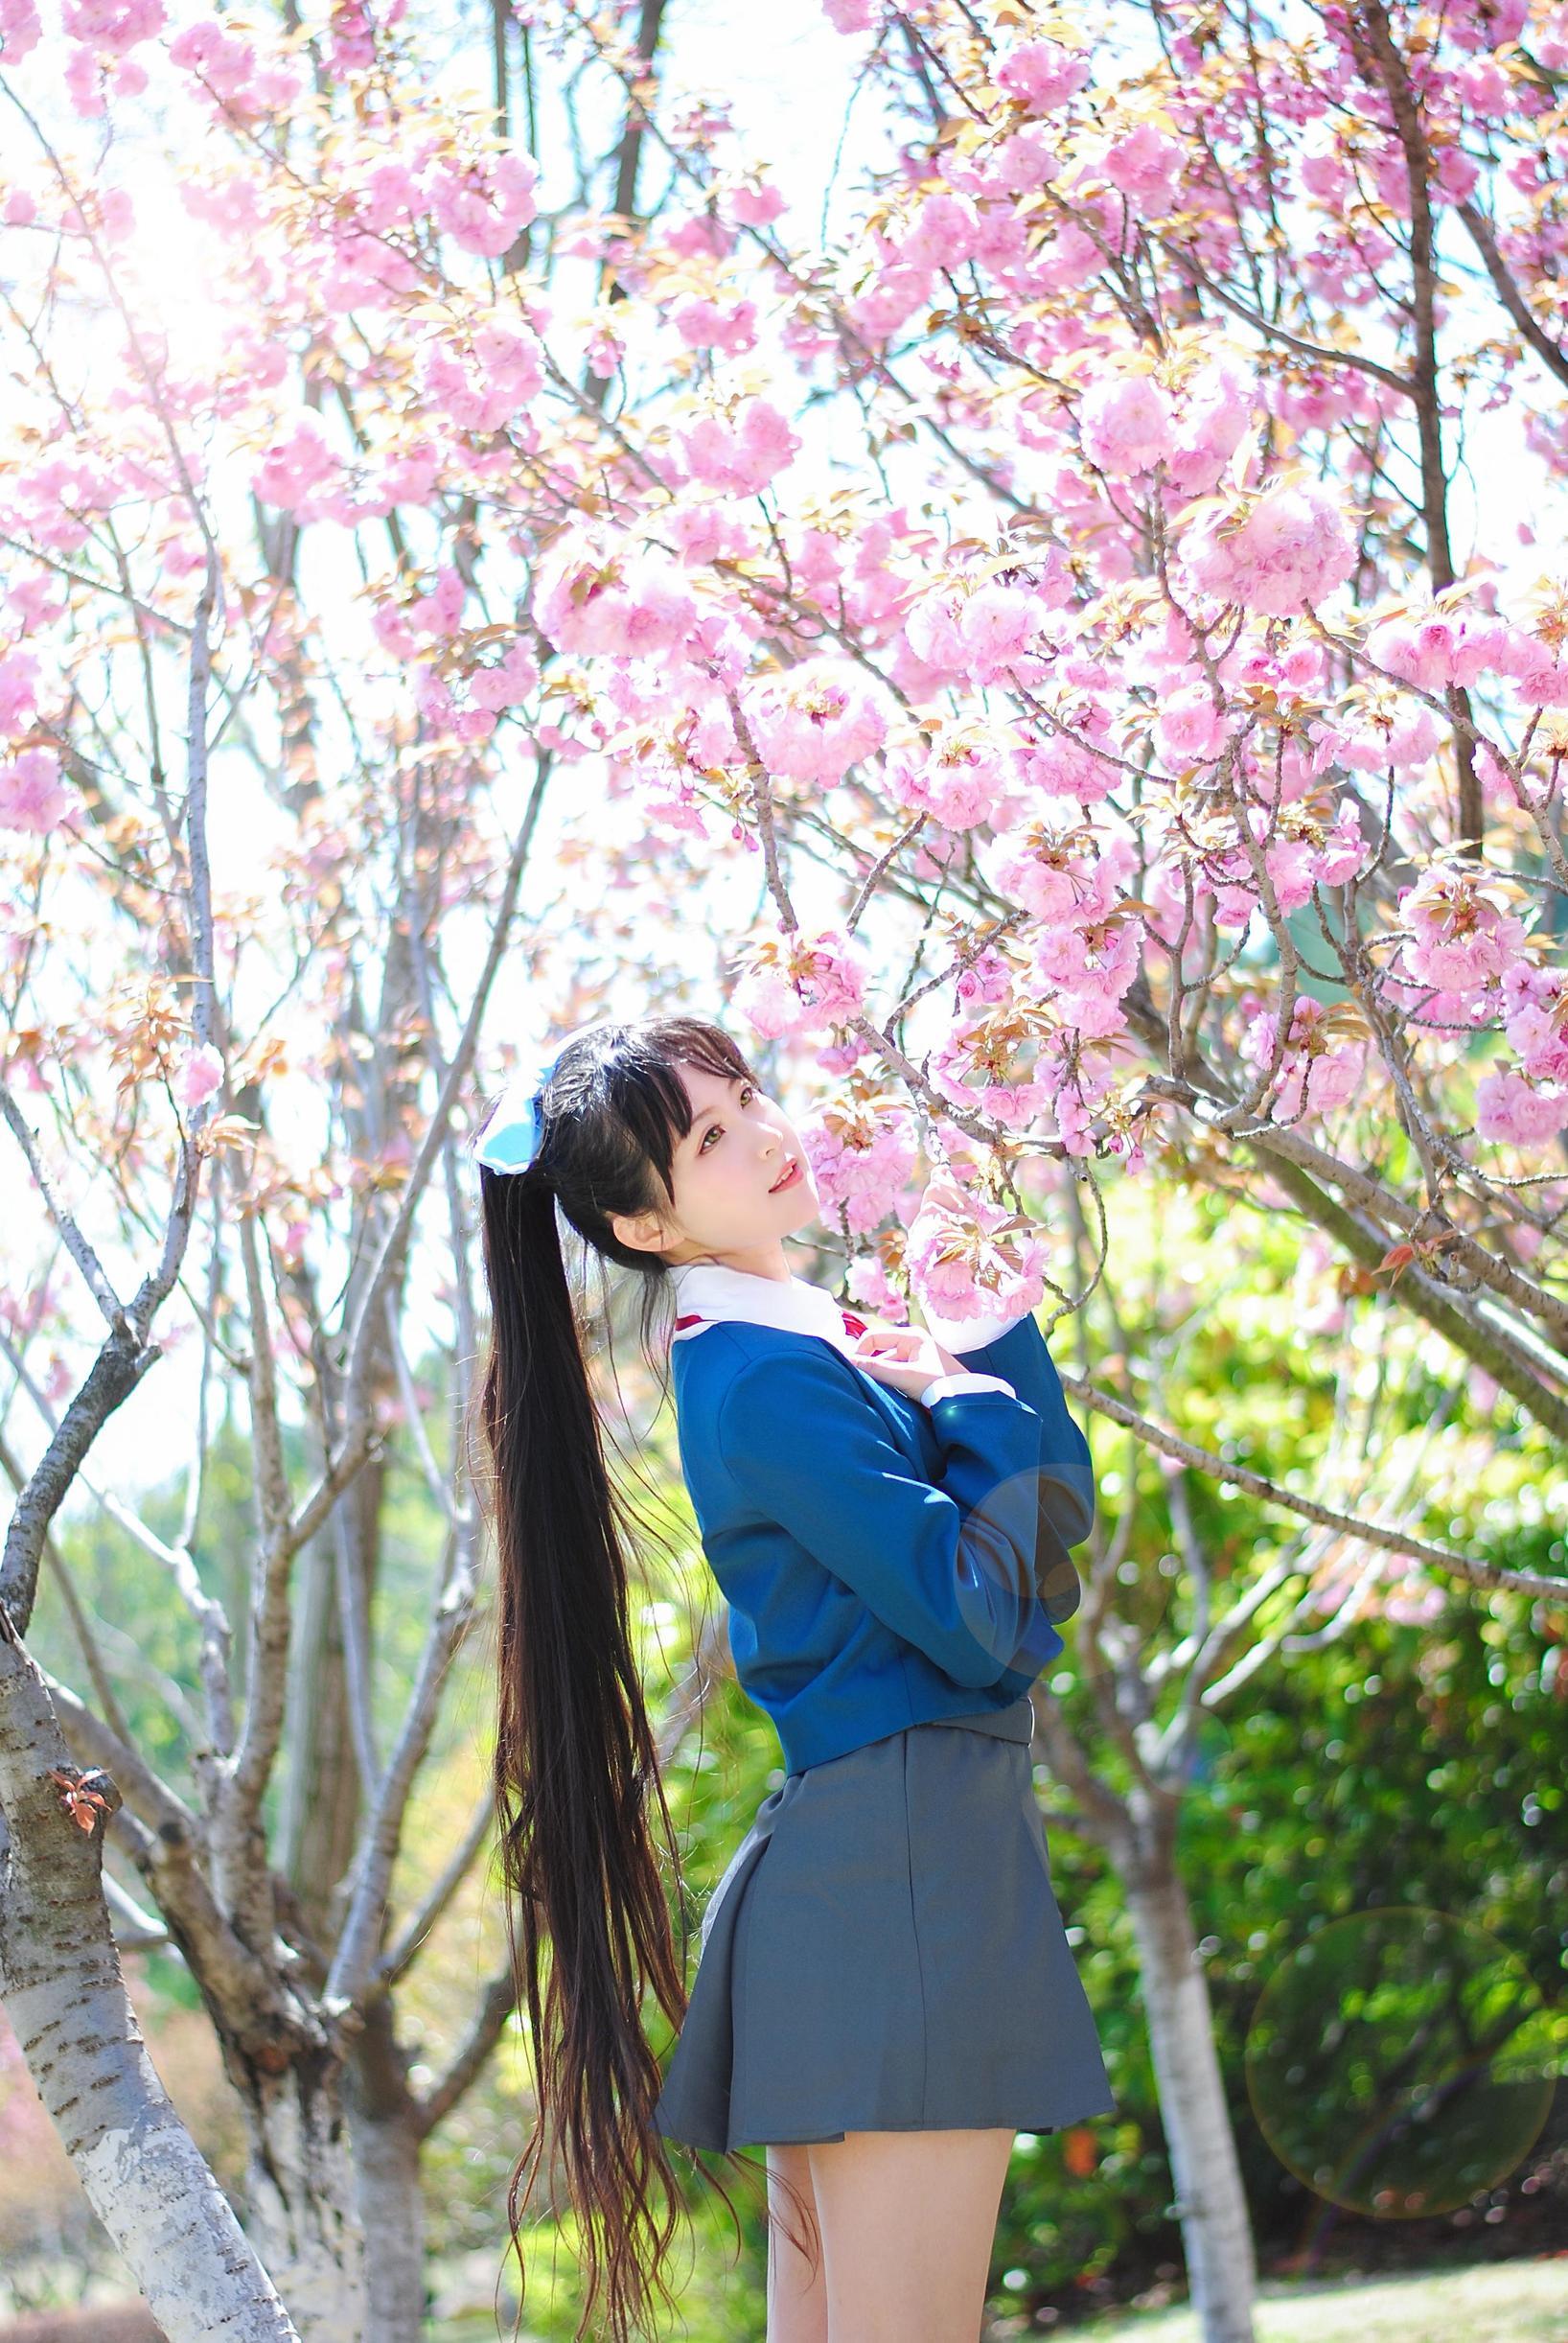 《LOVE LIVE!》美少女cosplay【CN:_李笑颜Lee】-第5张